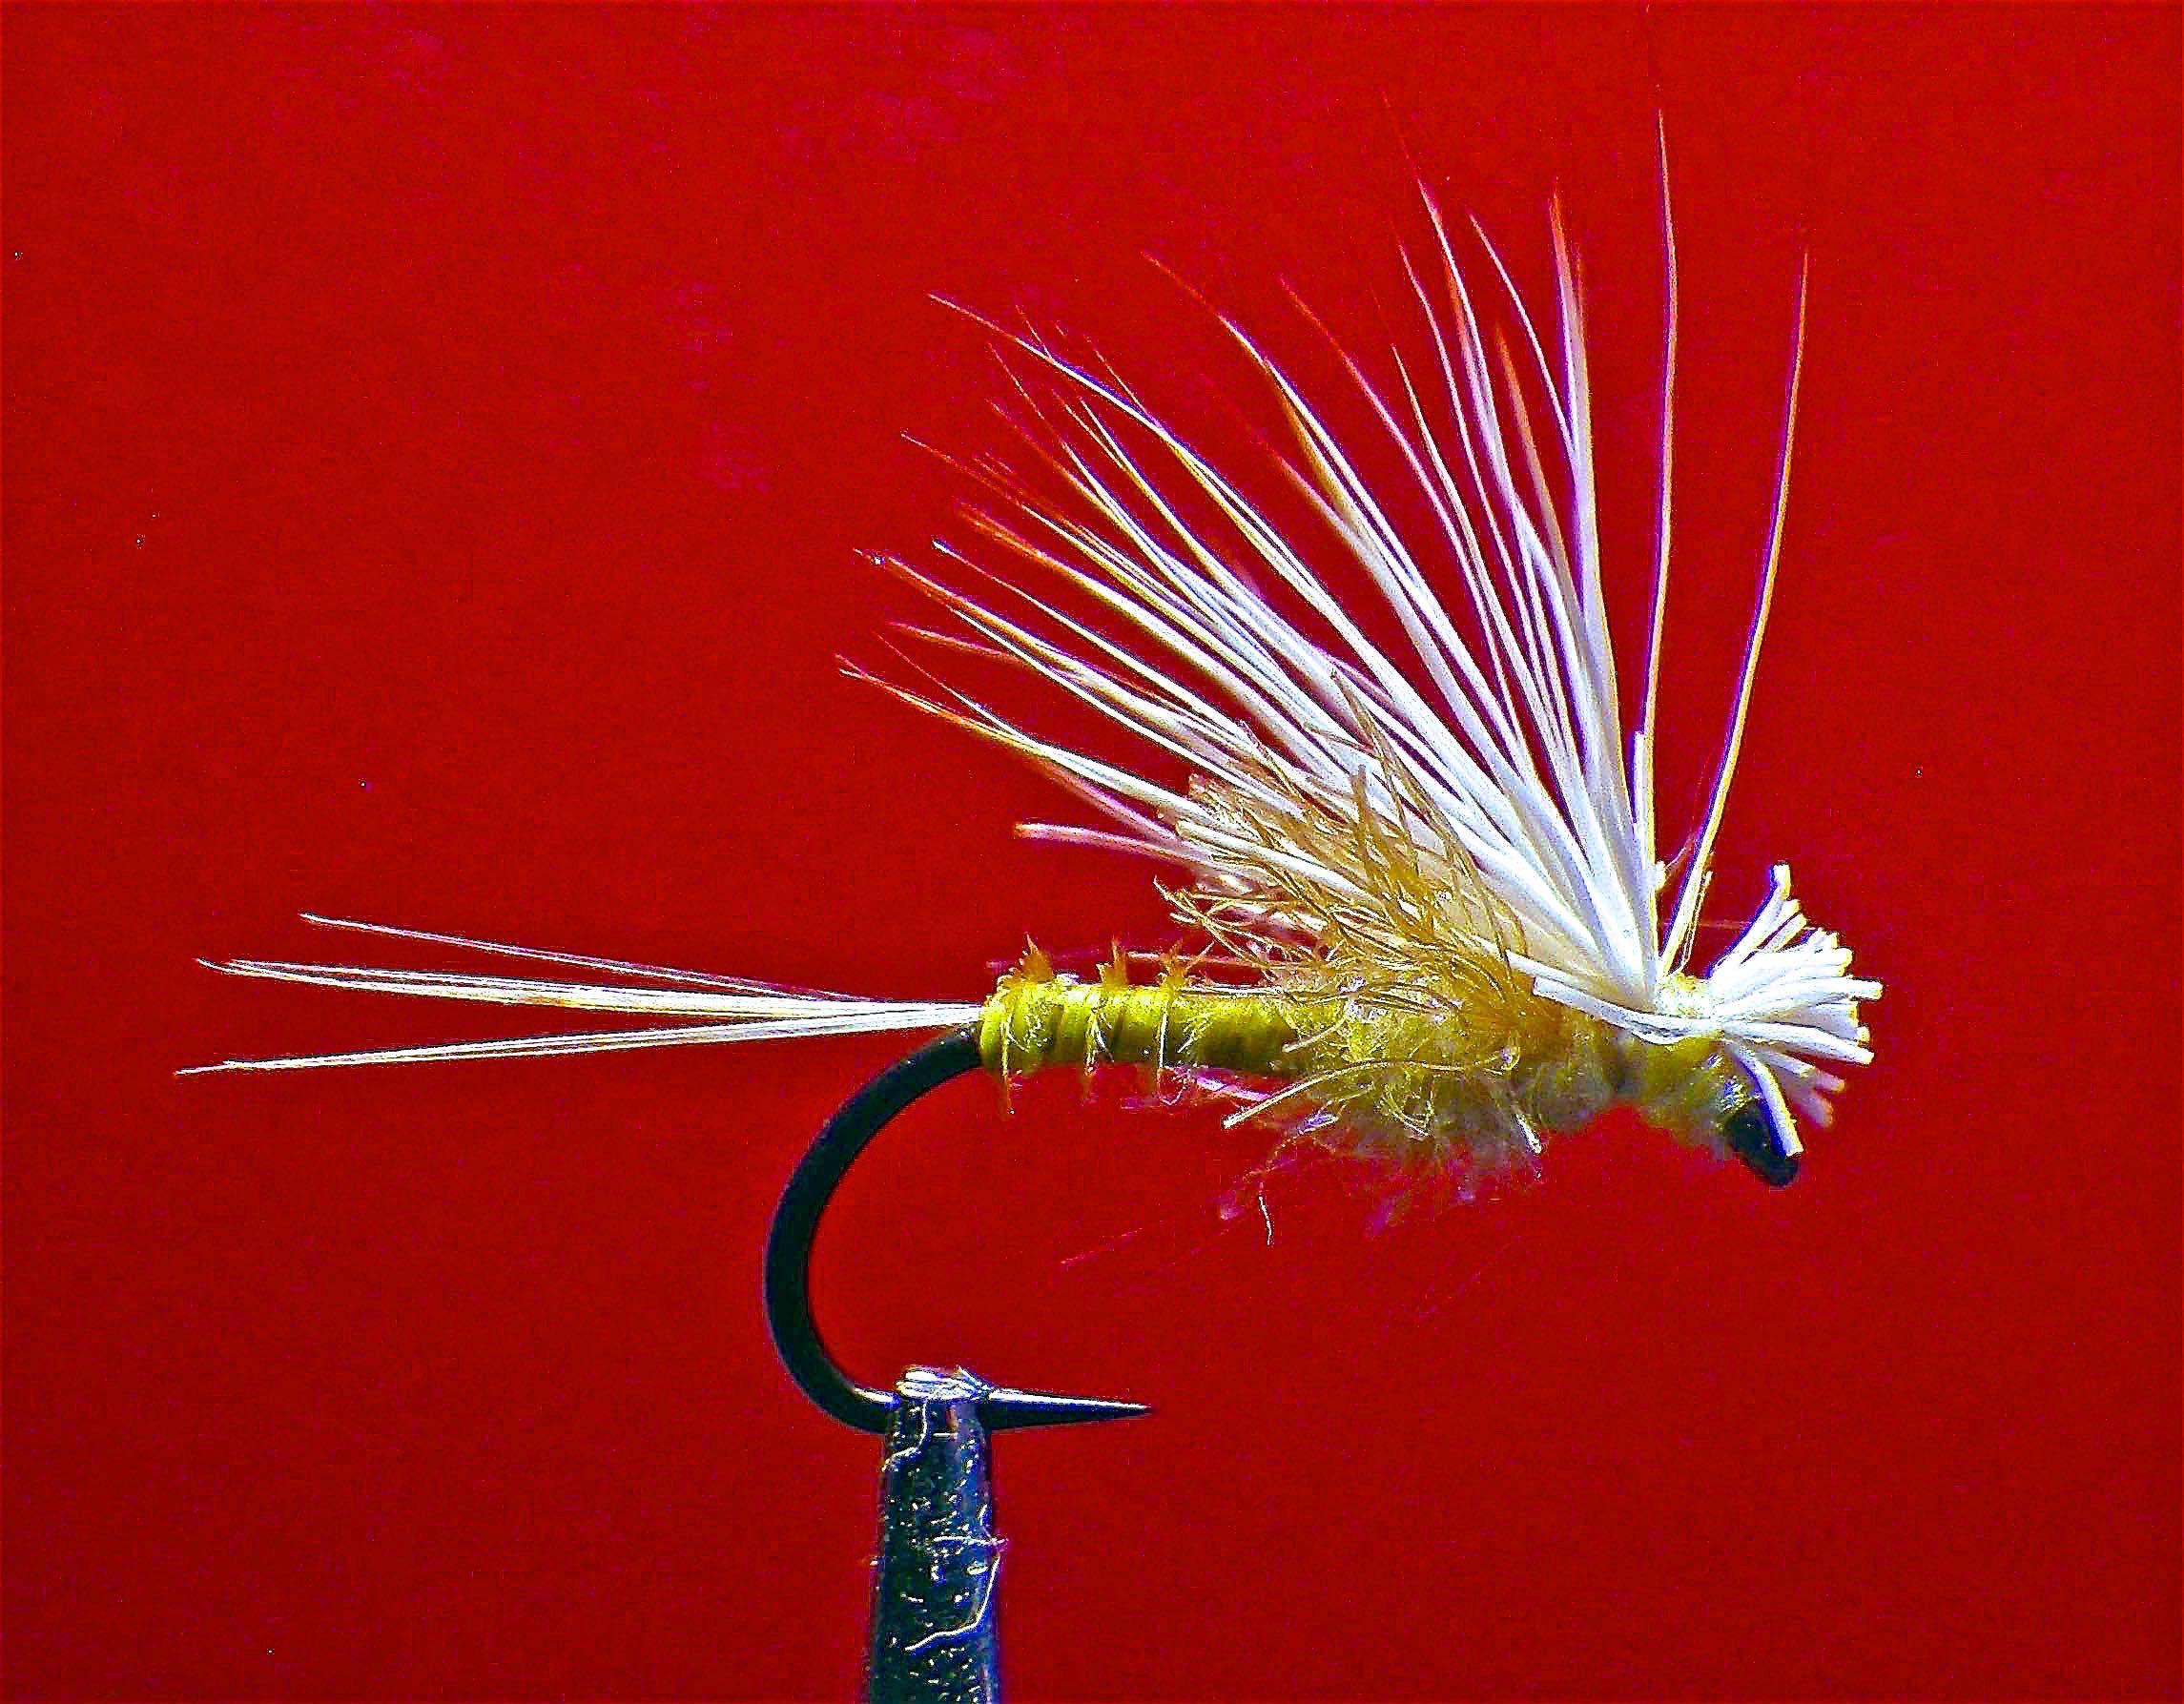 Barr de Flashback pâle matin dun Nymphe PMD Fly 16 18 ou 20 Umpqua